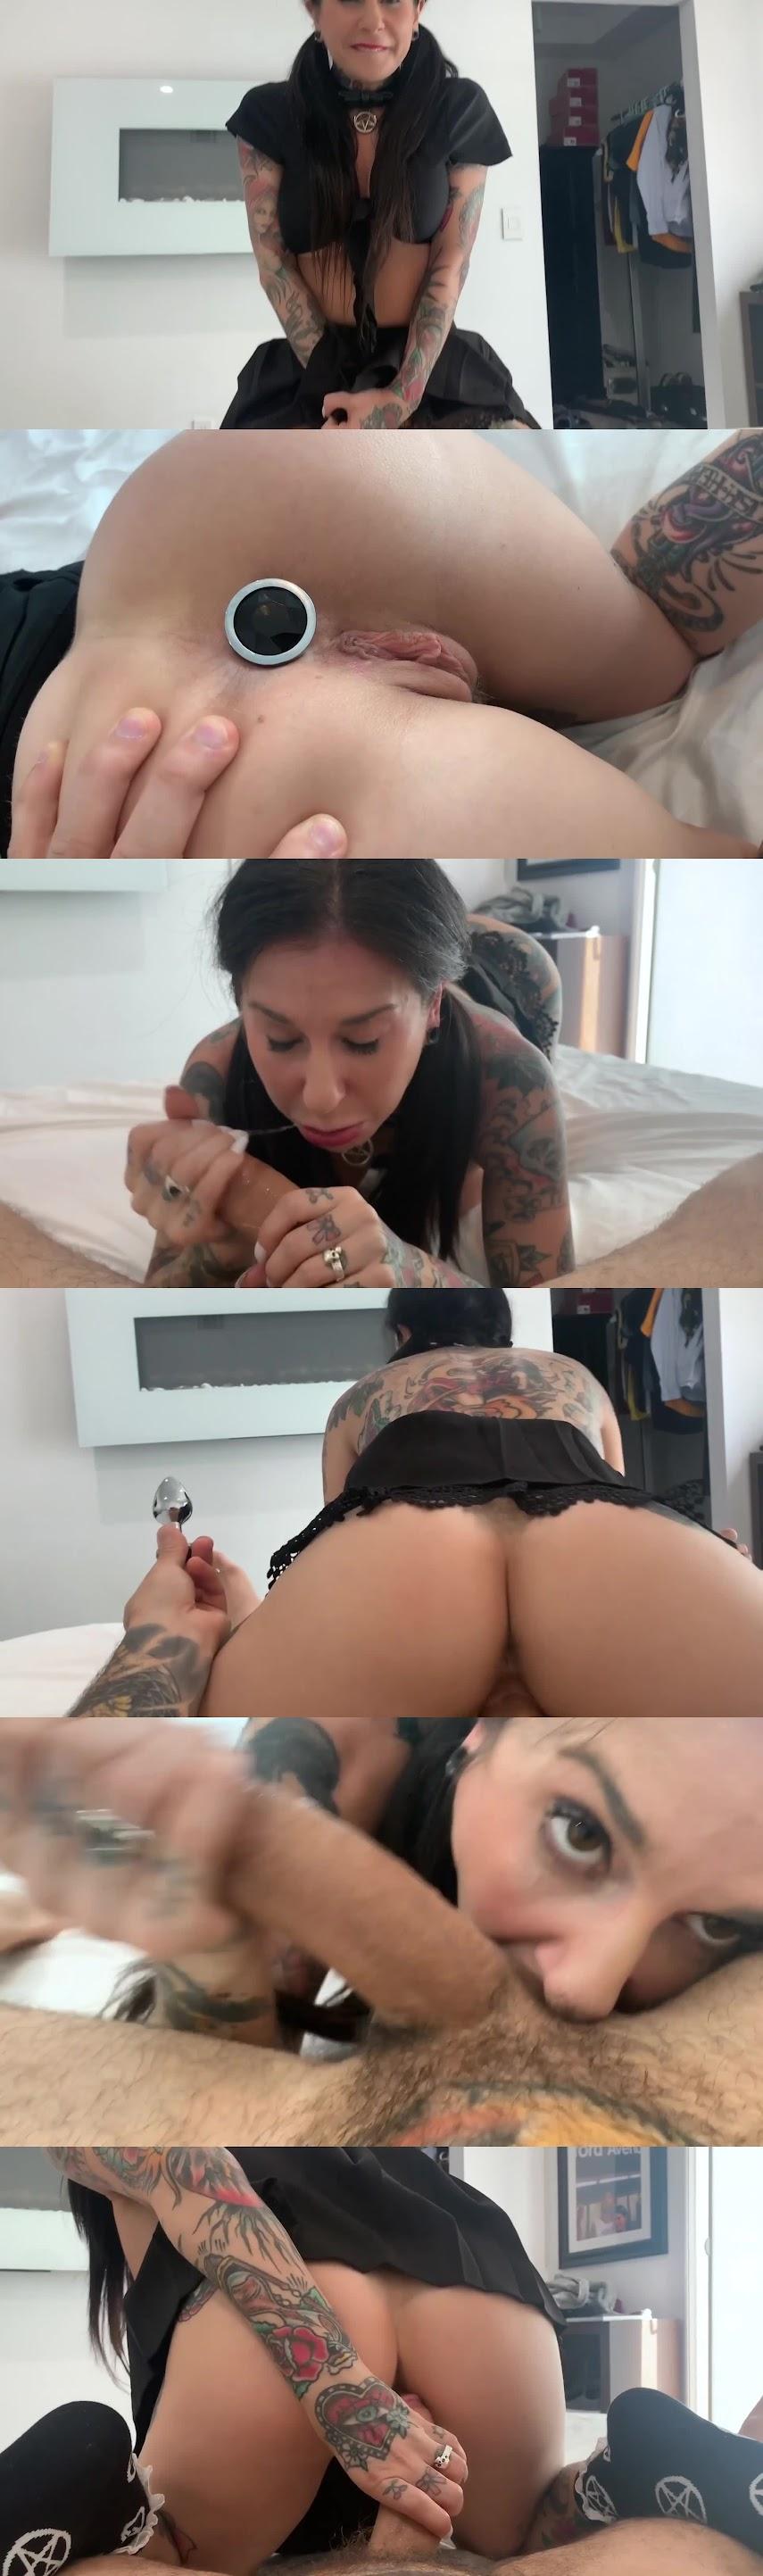 Joanna Angel Big Tit School Girl Anal POV sexy girls image jav